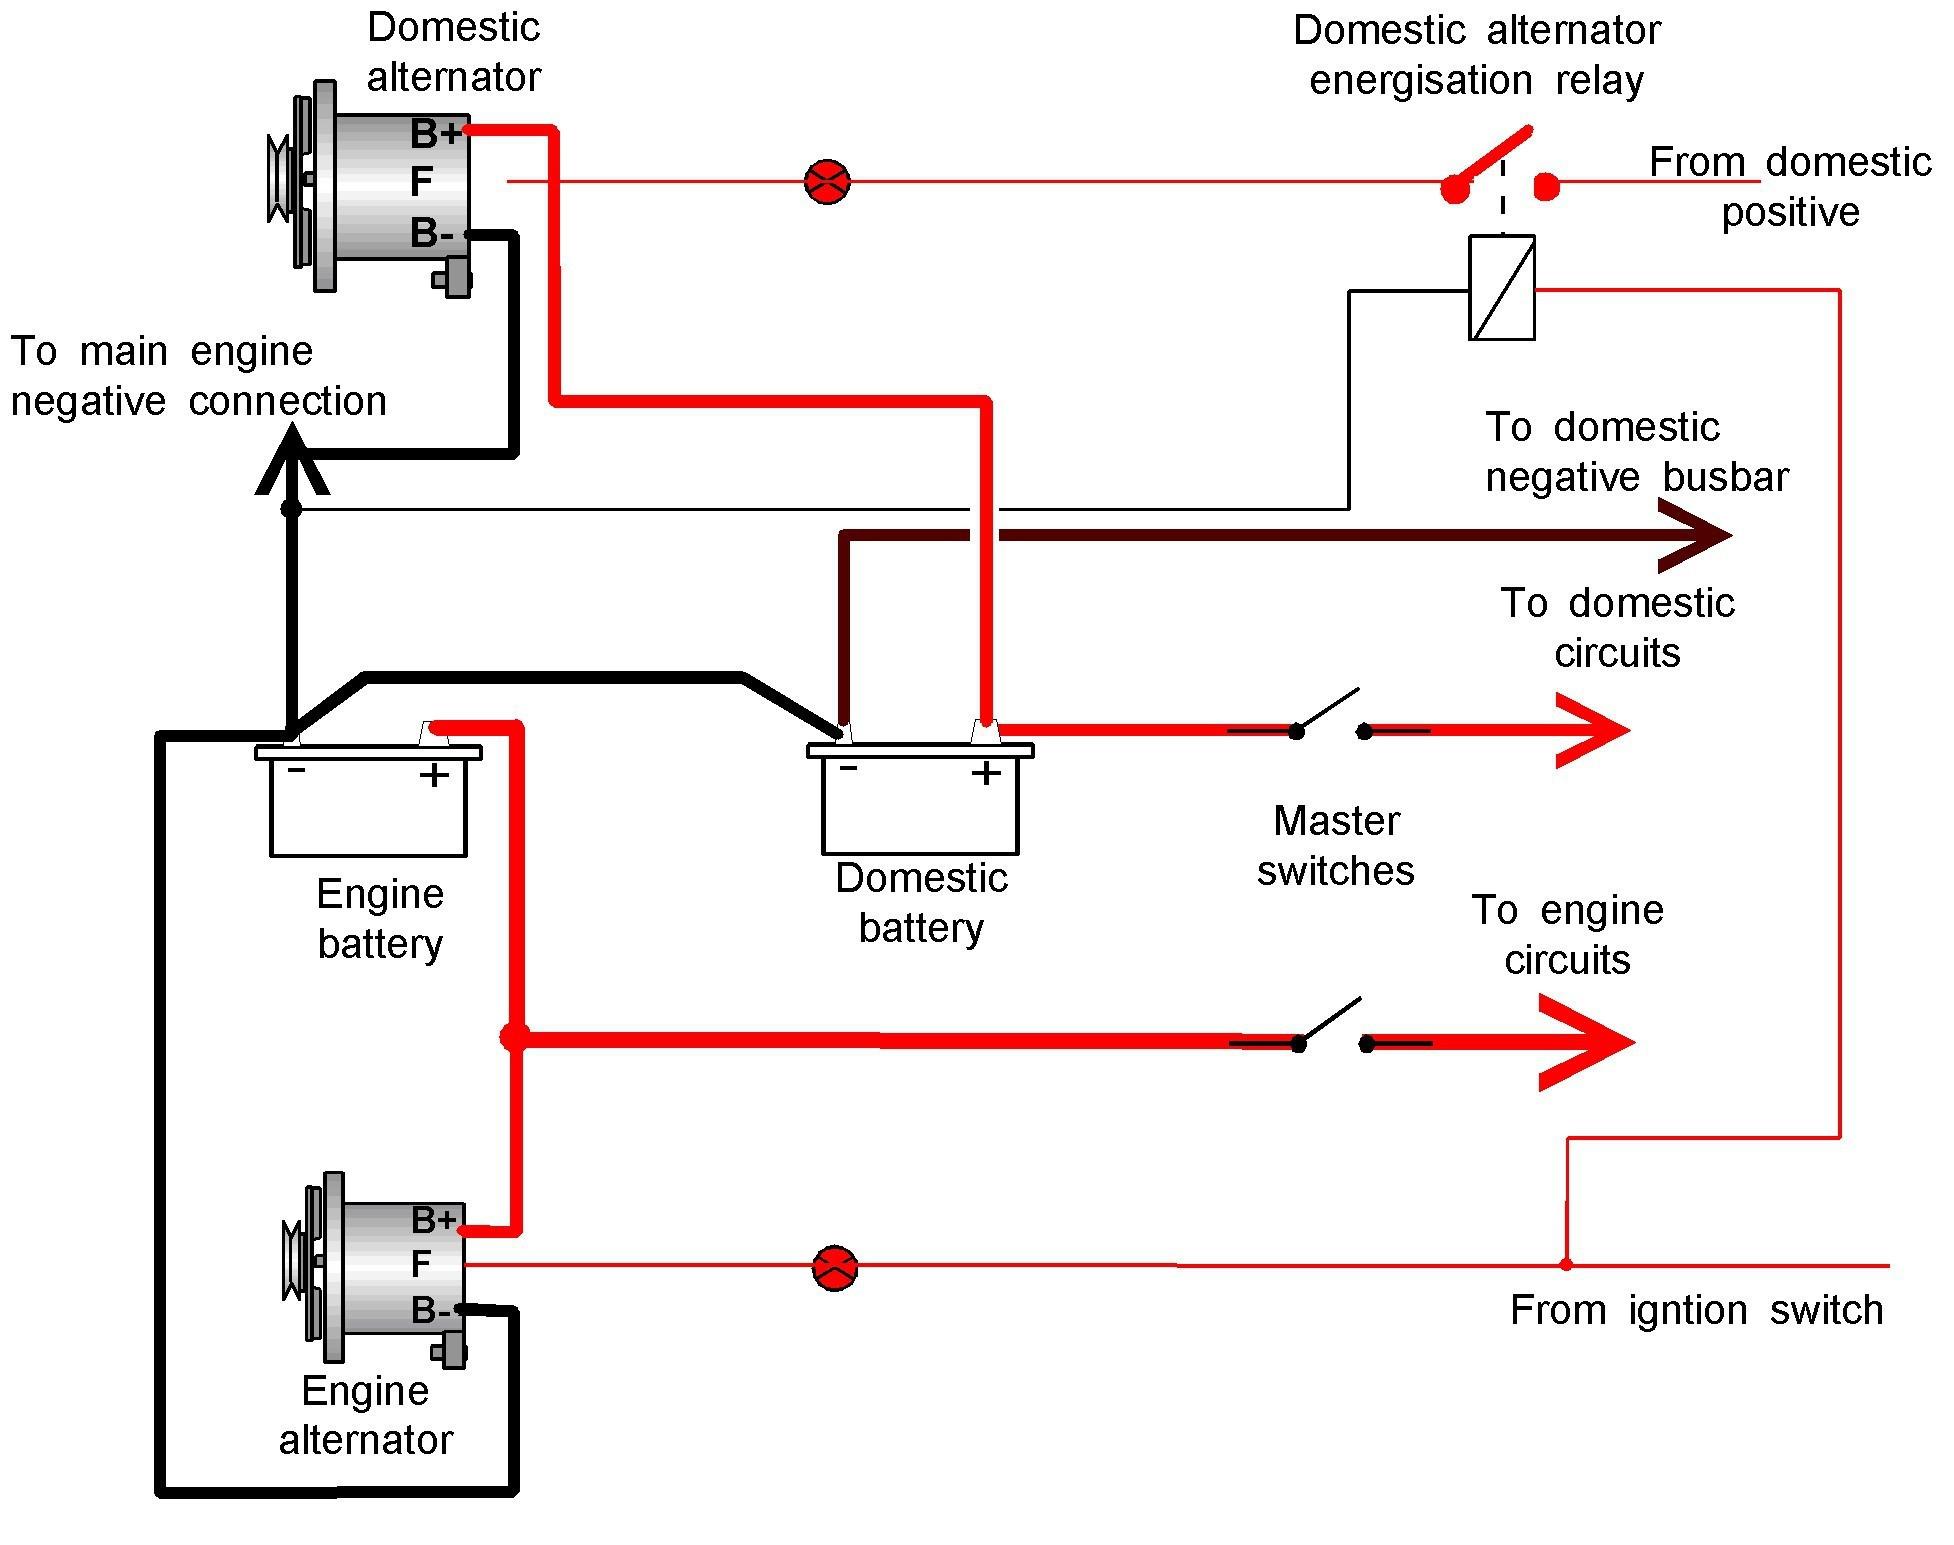 hight resolution of alternator relay diagram wiring diagram alternator relay diagram alternator relay diagram